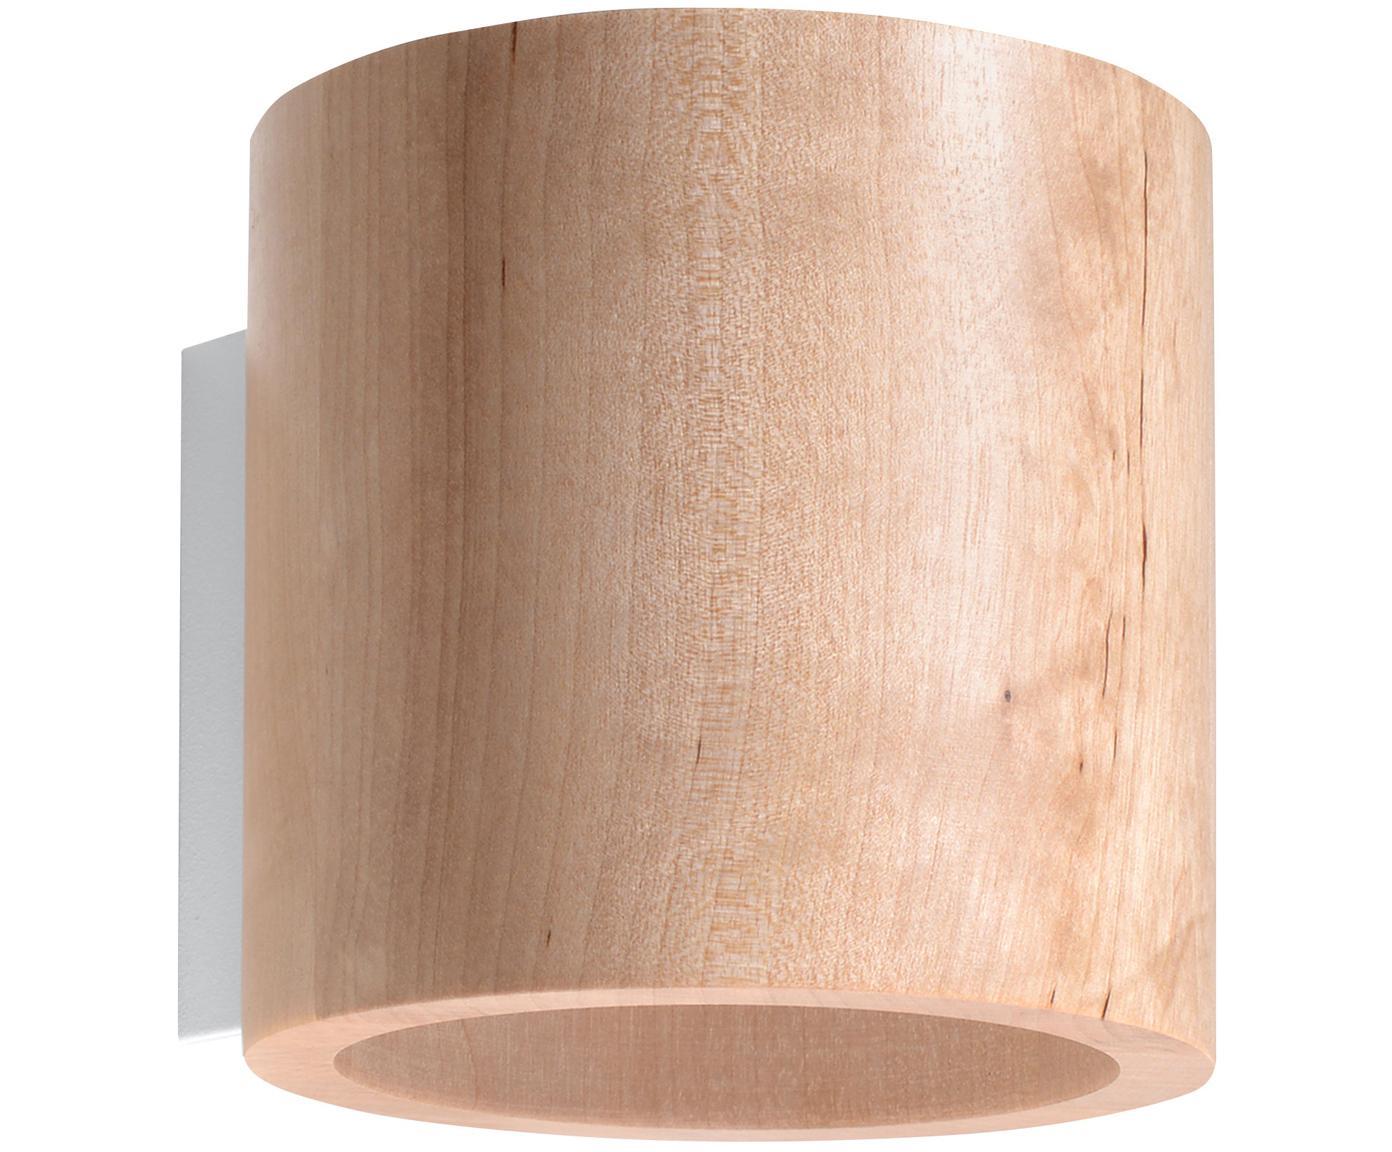 Wandlamp Roda, Hout, Lichtbruin, Ø 10 x H 12 cm